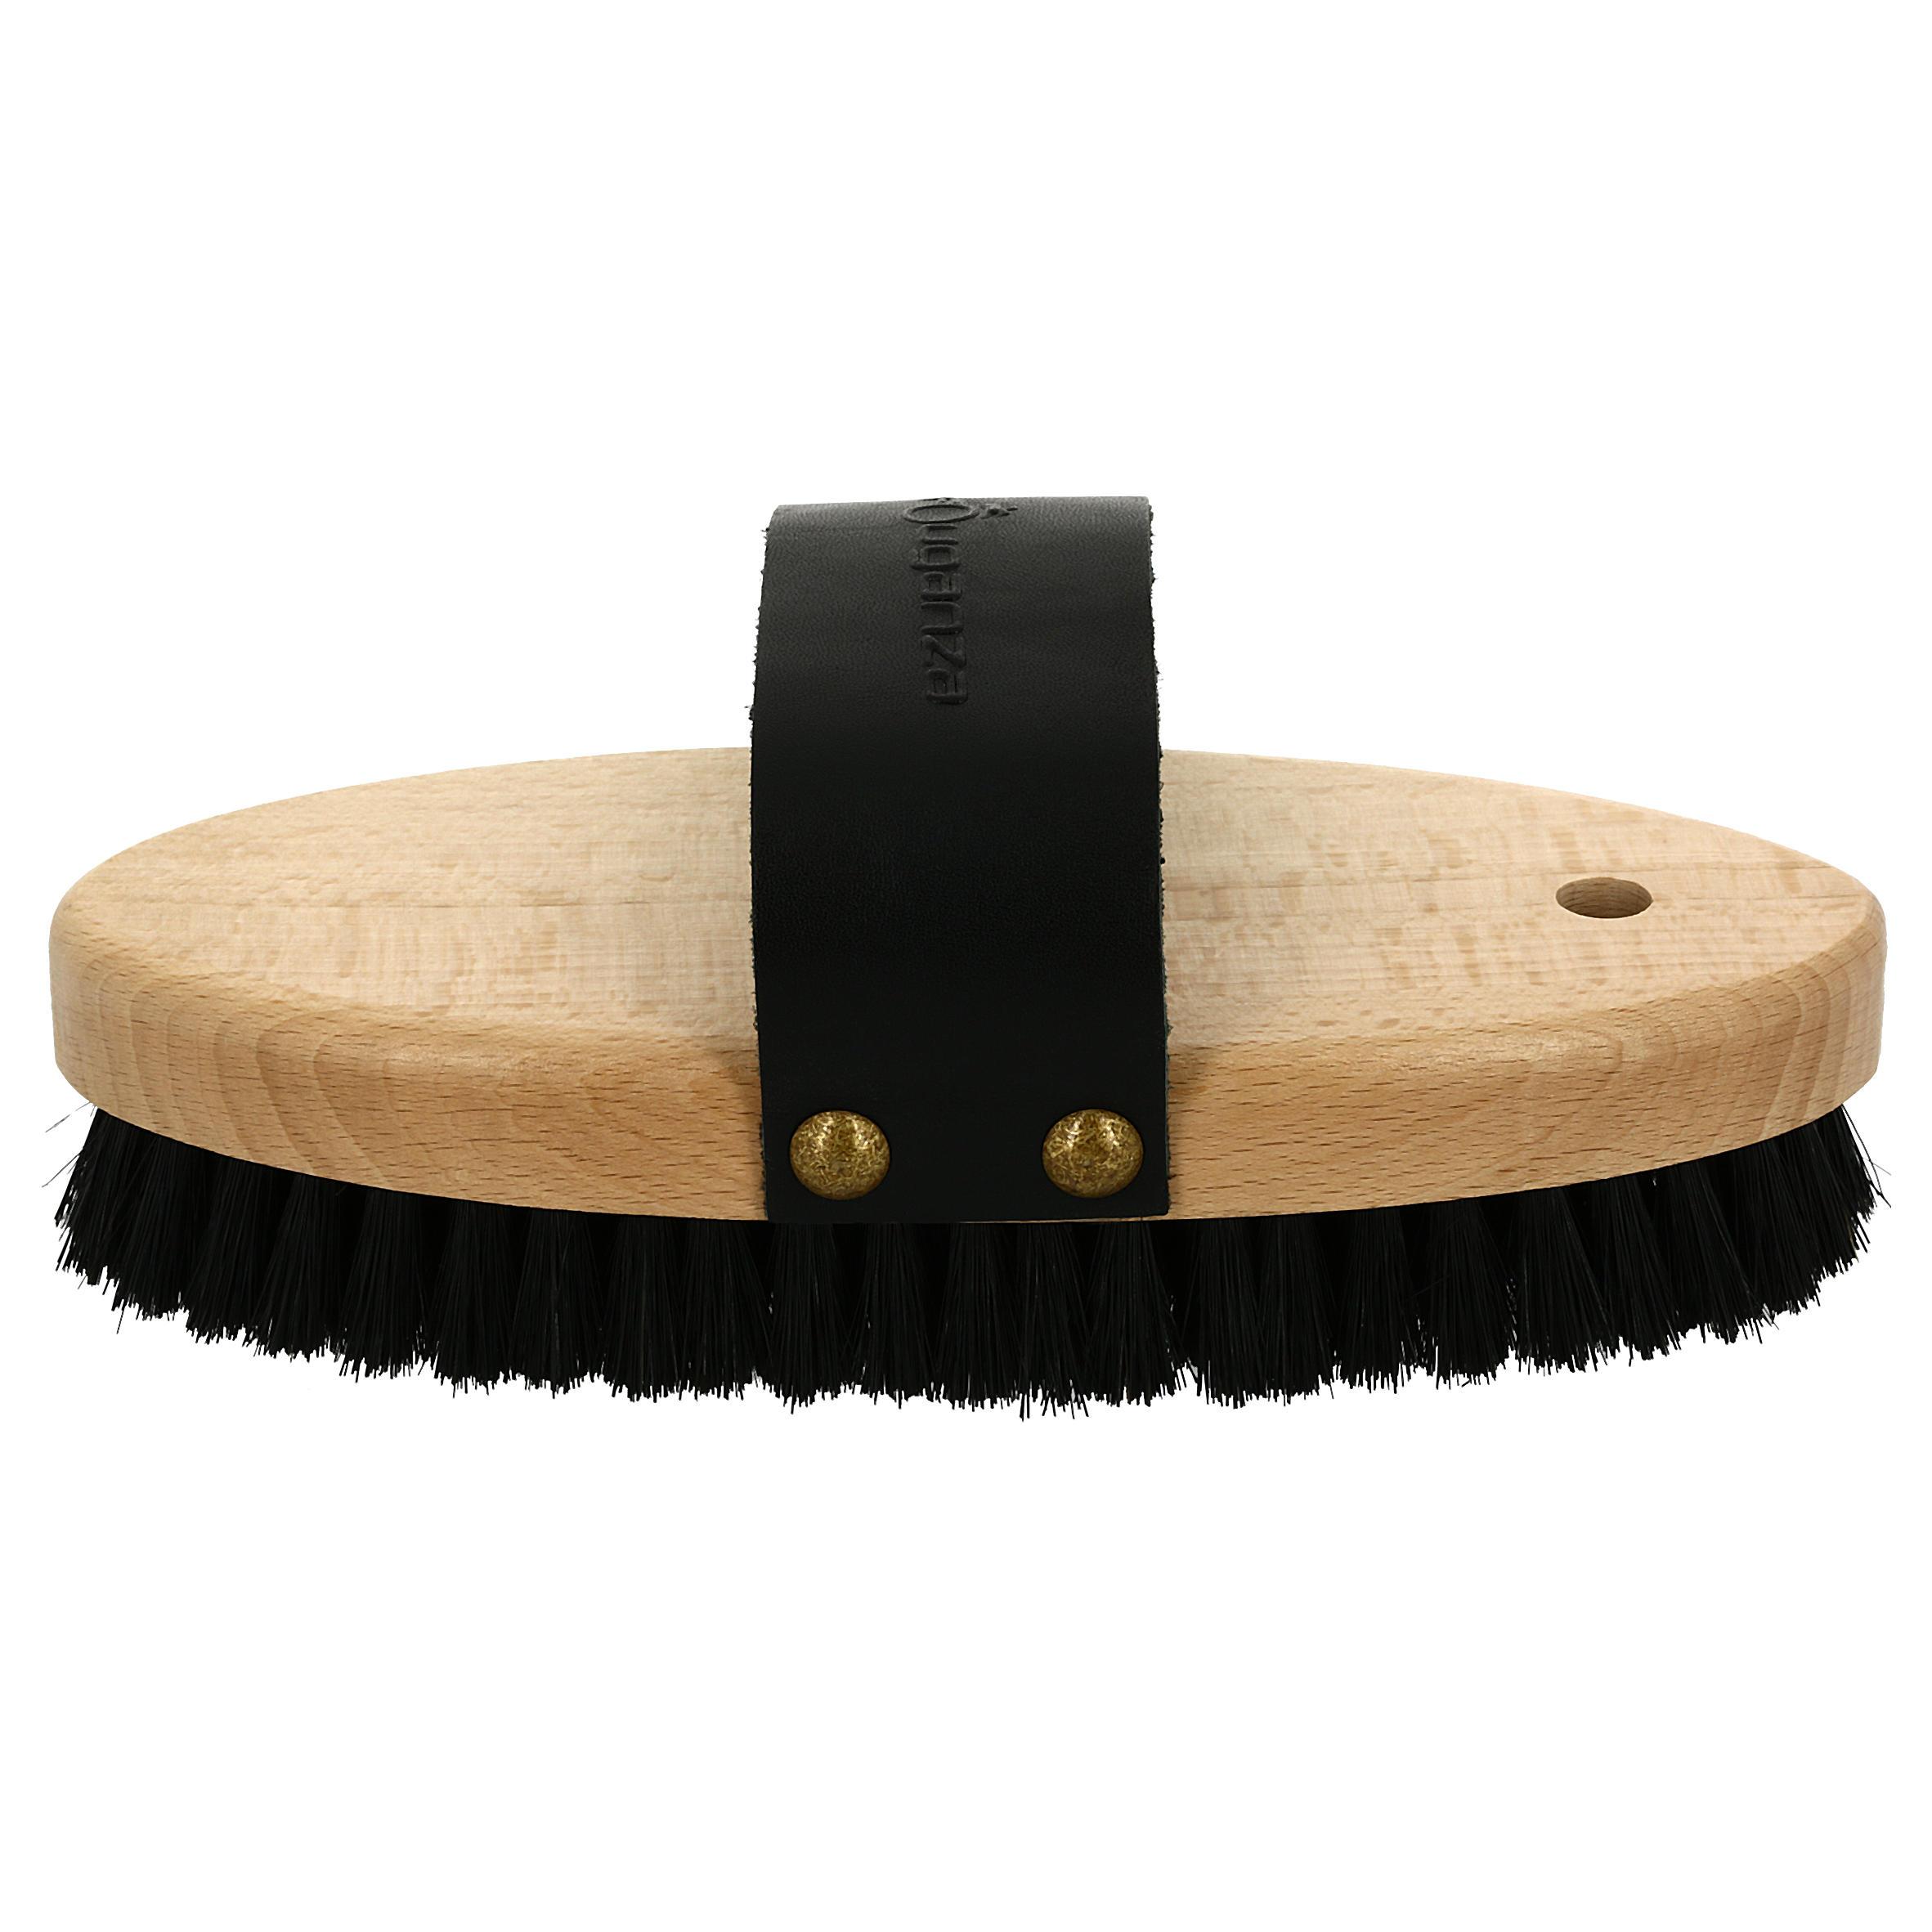 Cepillo suave de madera para equitación SENTIER